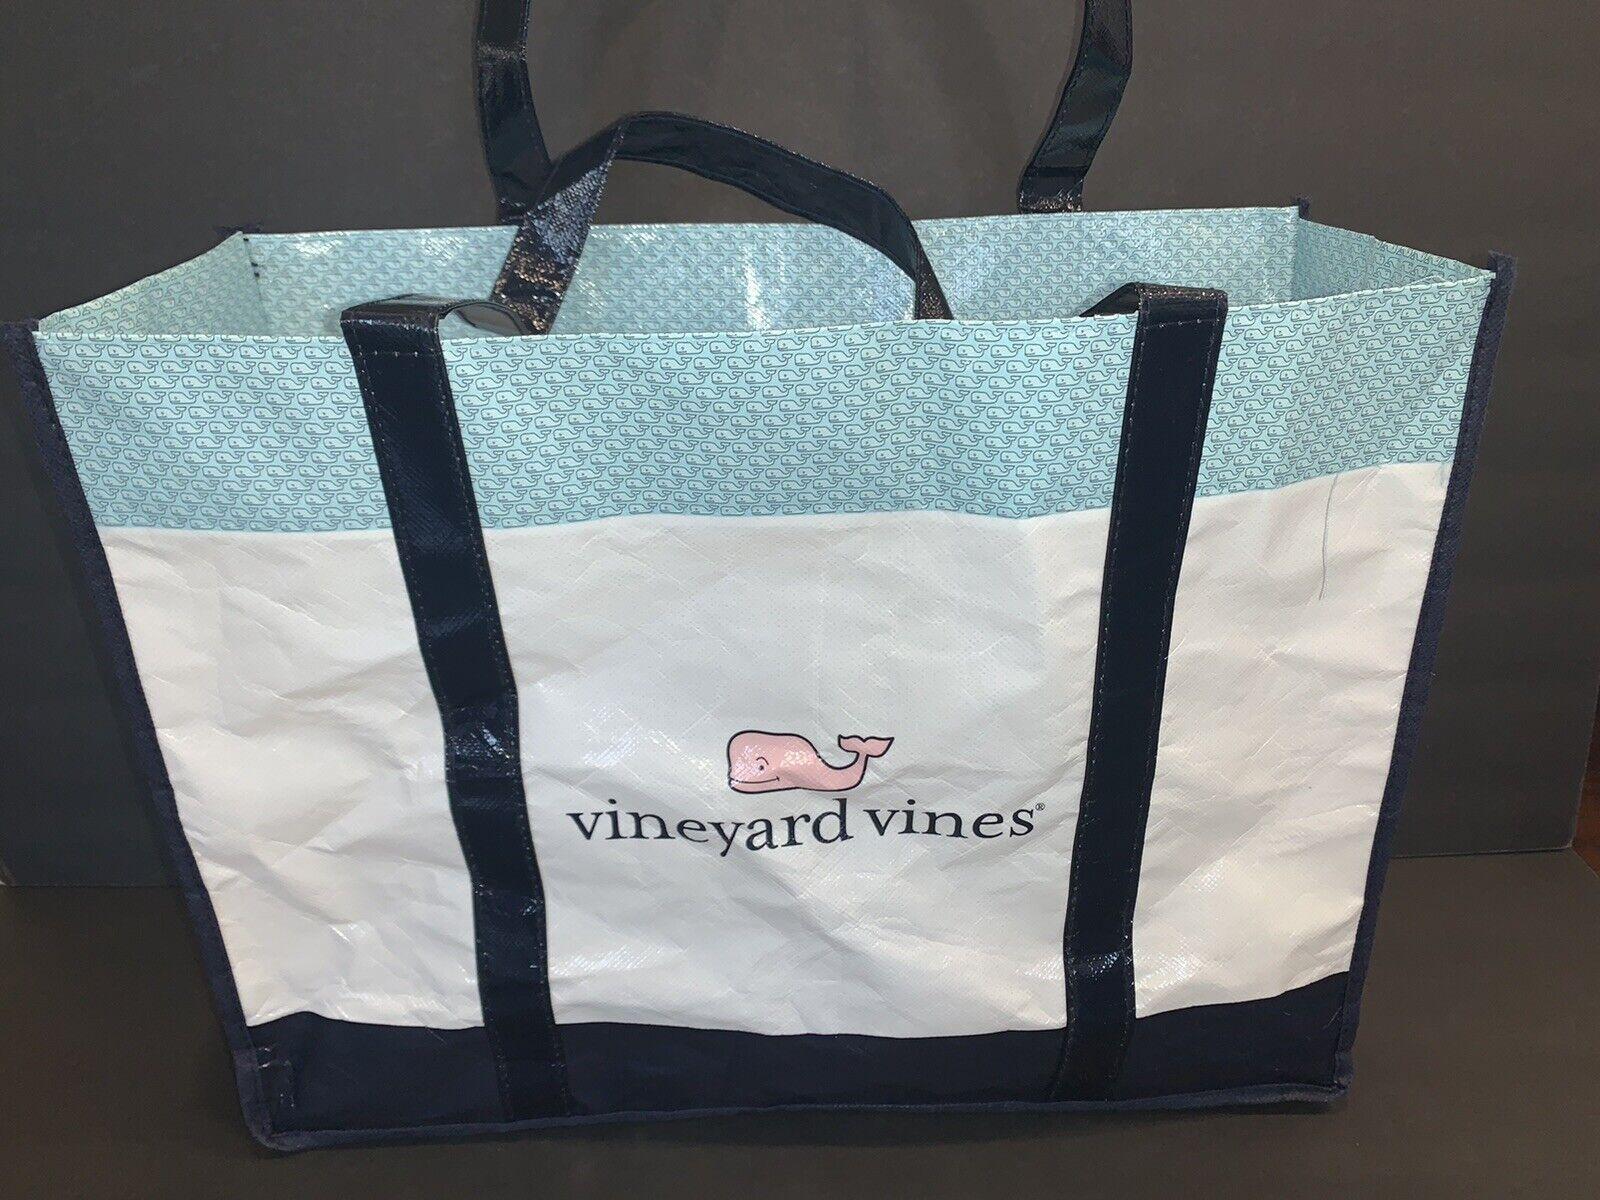 "Vineyard Vines Plastic Tote Bag Reusable Shopping Bag 13/"" x 9/"" with Handles"